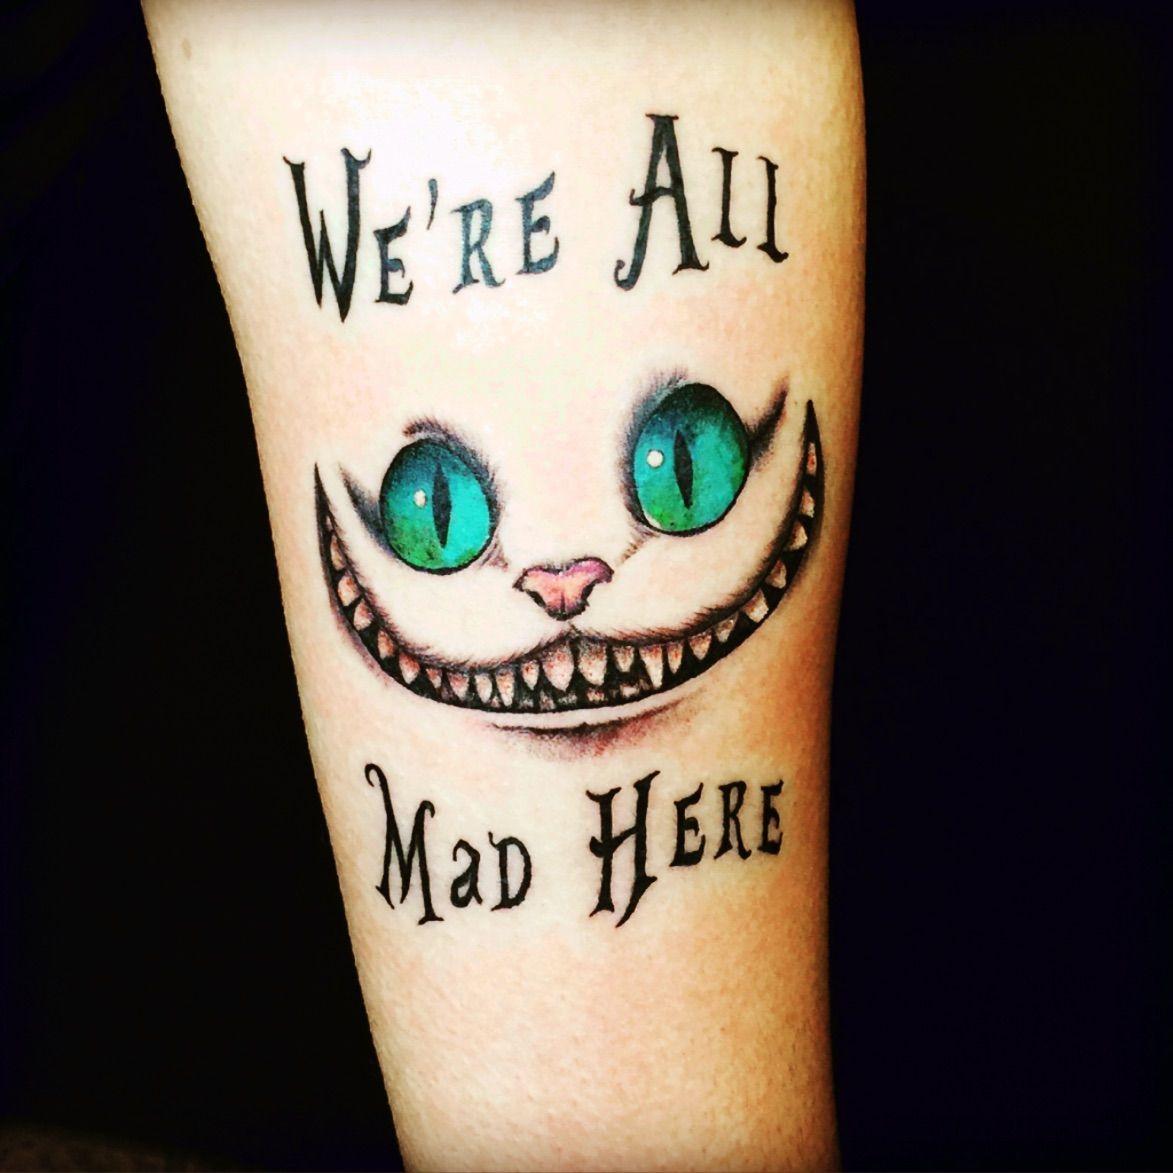 Aliceinwonderland Cheshirecat Tattoos For Women Mad Hatter Tattoo Foot Tattoos For Women